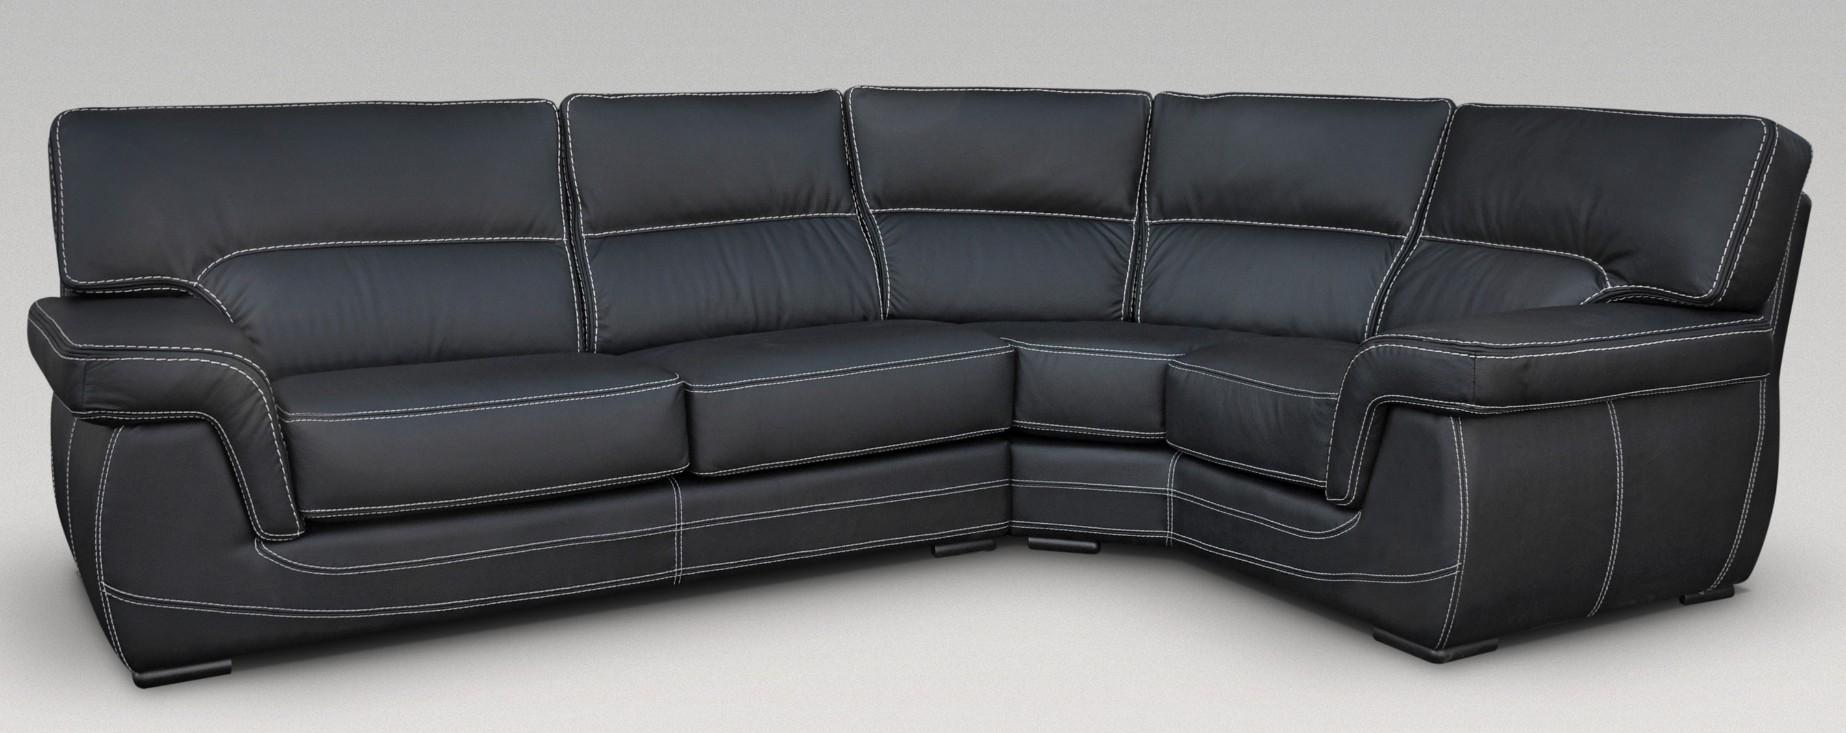 black grey corner sofa sale feather down sectional babylon-corner-group-italian-leather-sofa-black.jpg